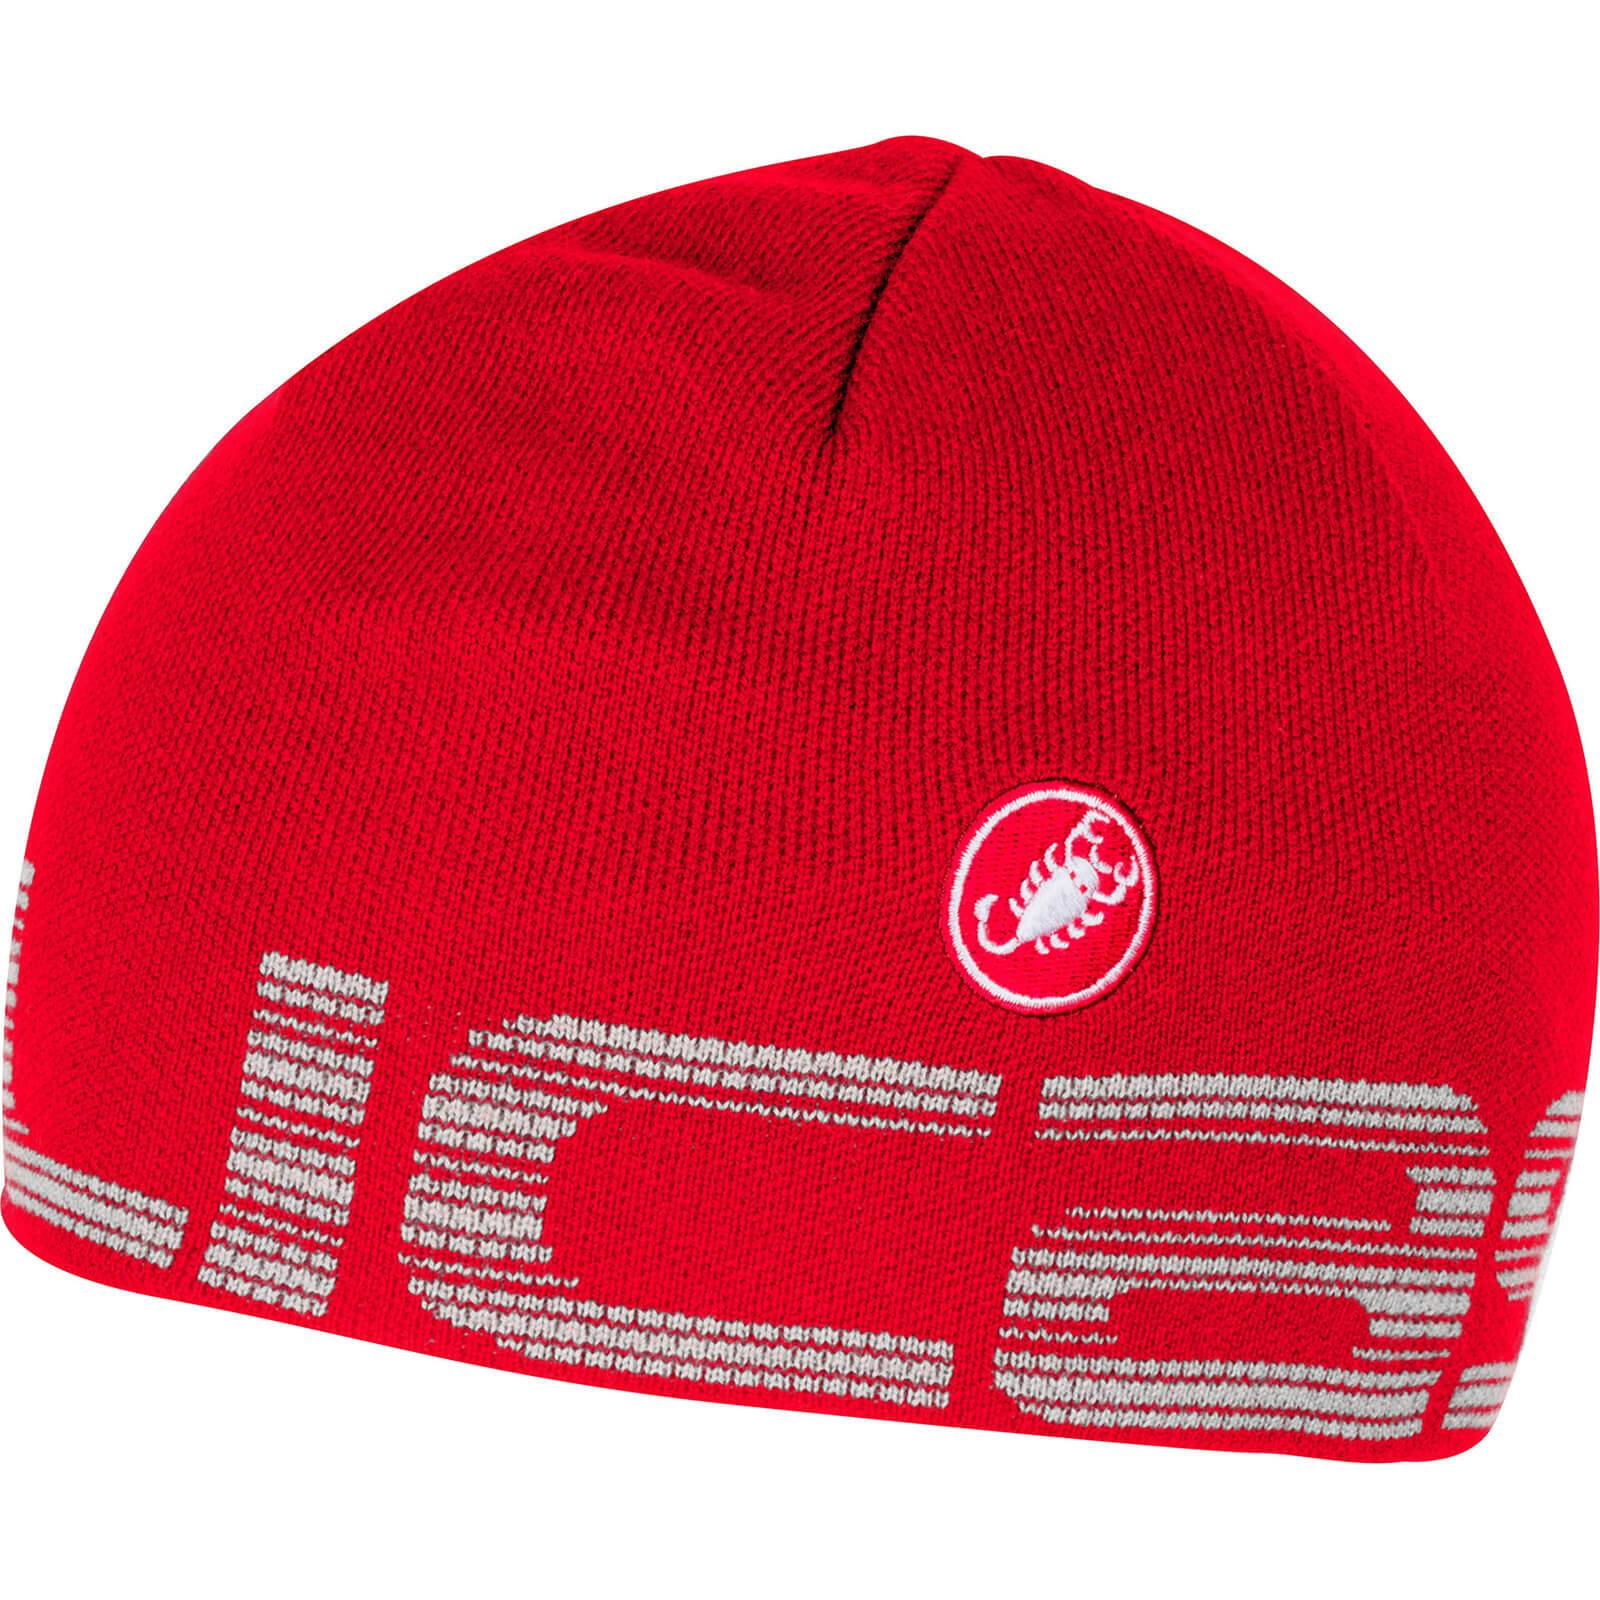 Castelli Liberta Beanie Hat - Red/White